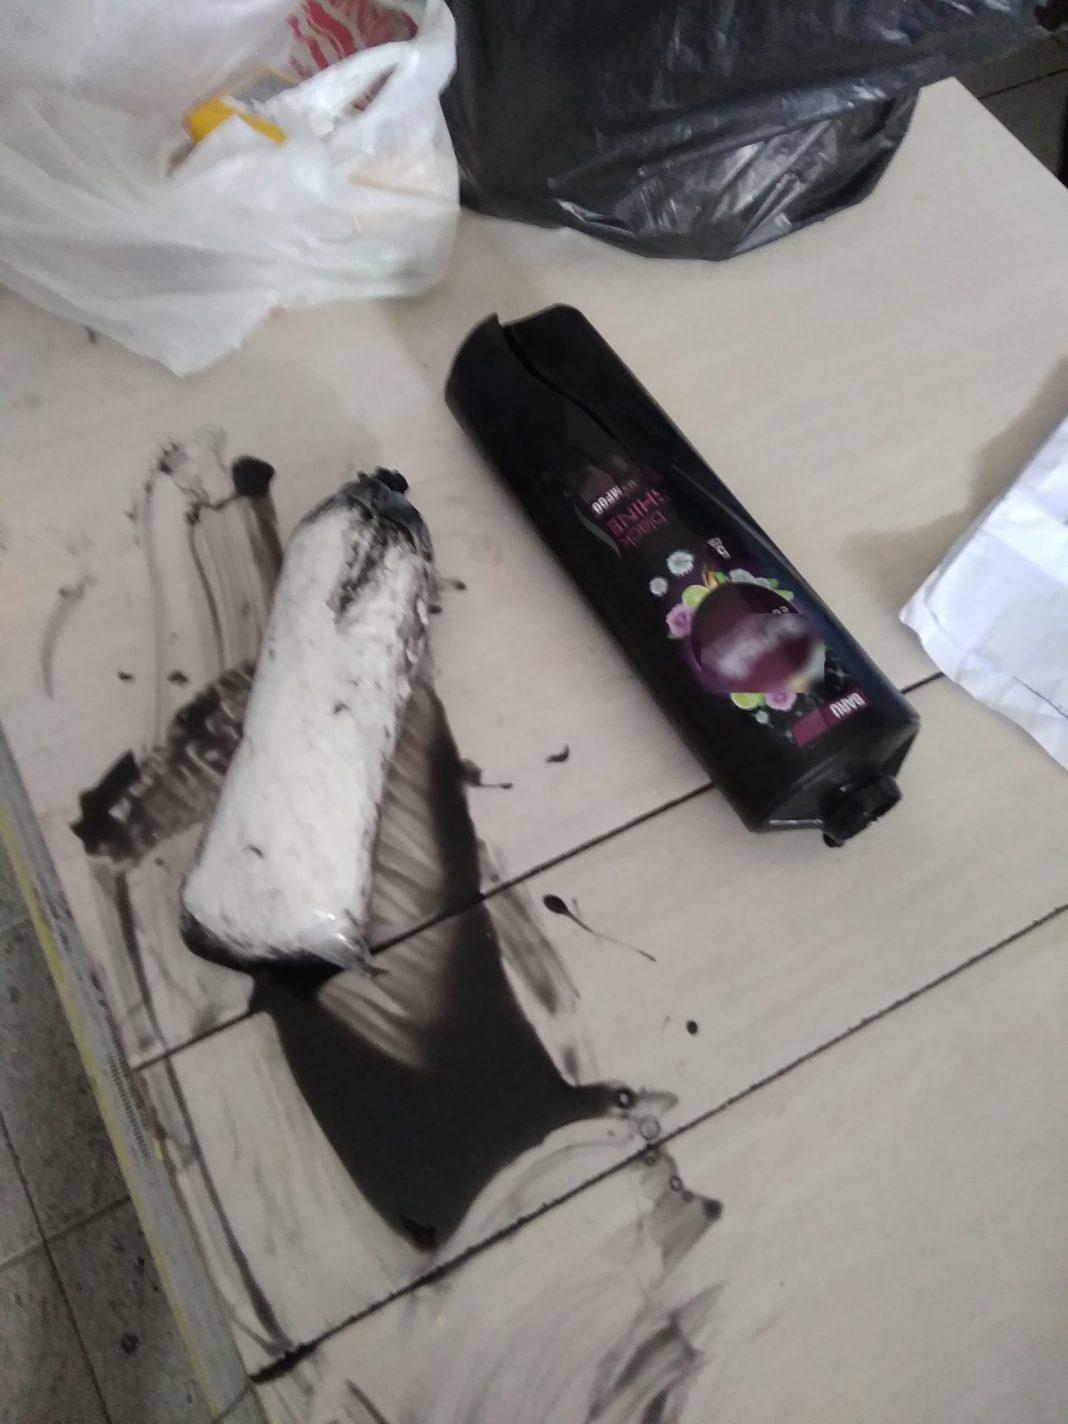 Petugas Rutan Ponorogo Gagalkan Upaya Penyelundupan Narkotika dalam Botol Sampo